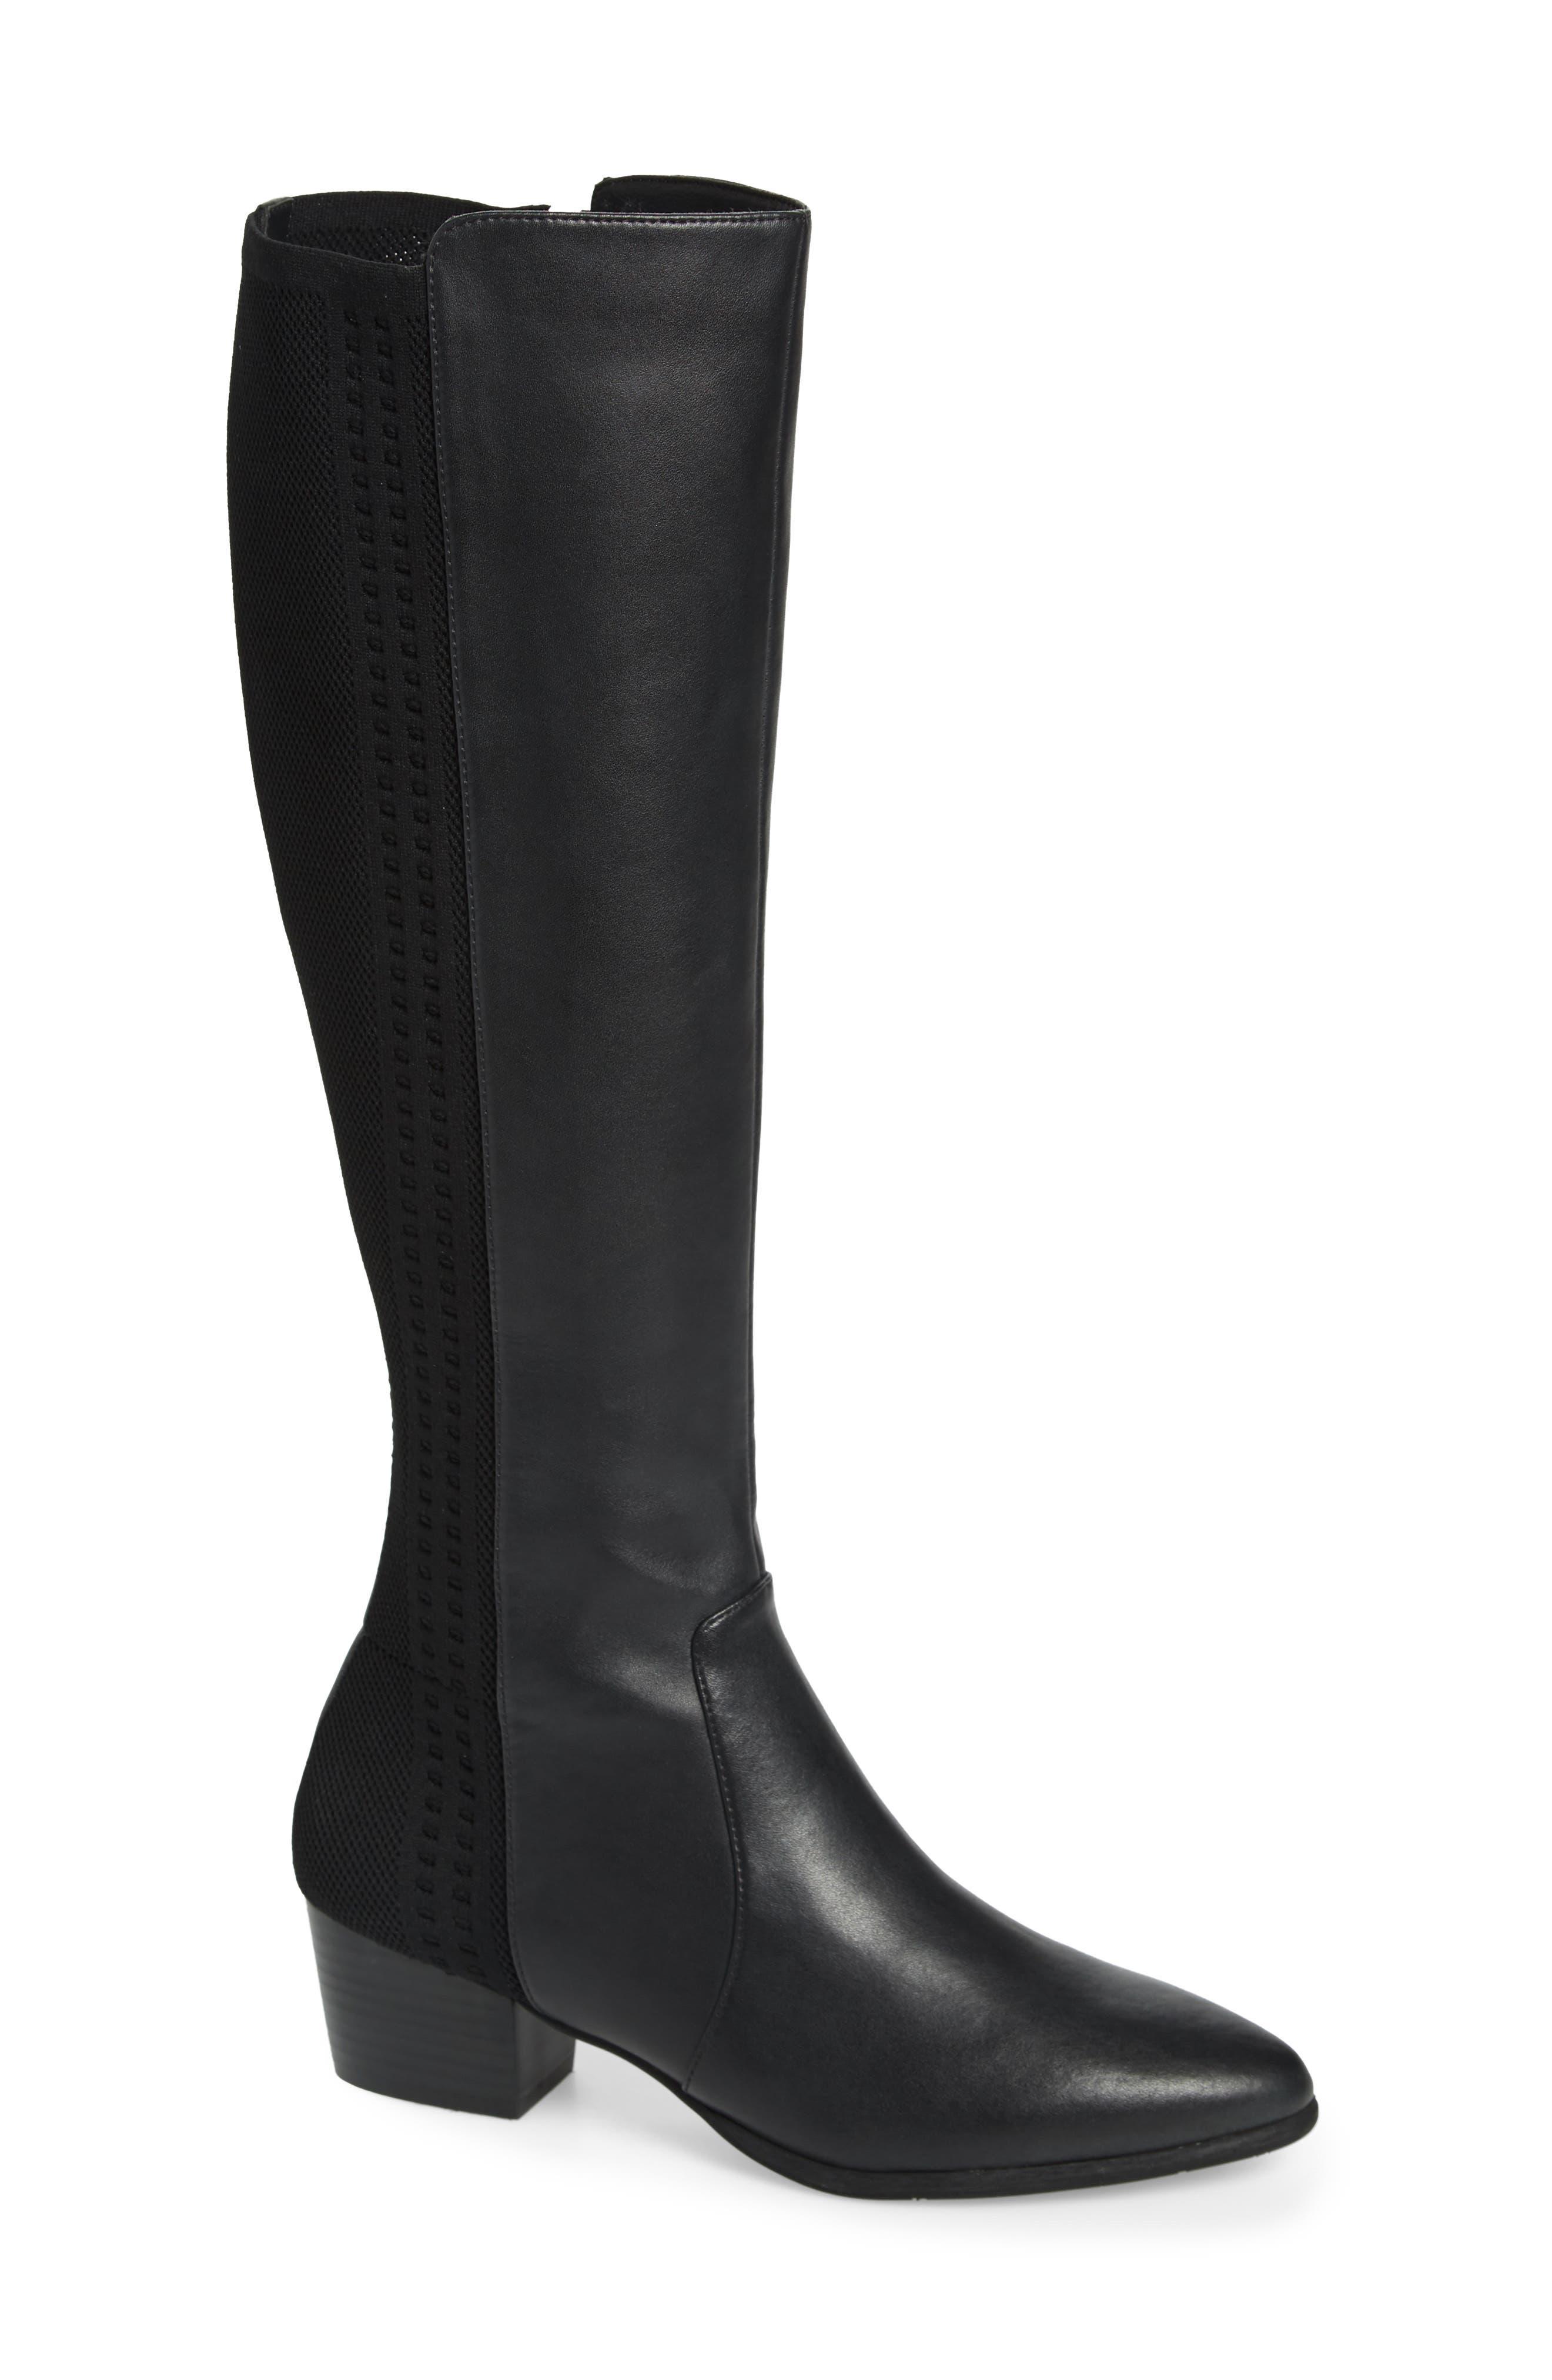 Nic + Zoe Windsor Knee High Boot, Black